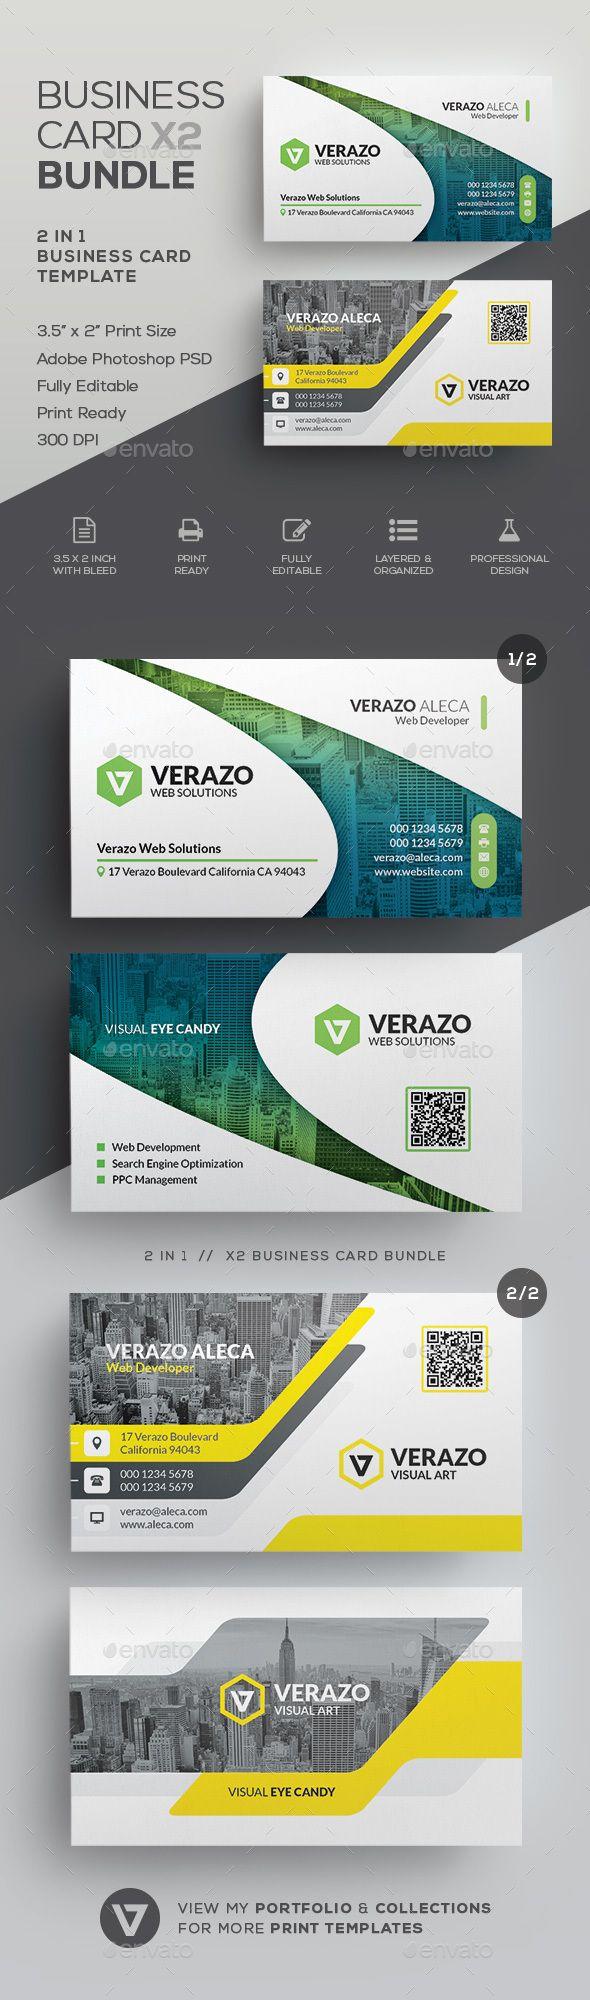 Business Card Bundle 60 Modern Business Cards Design Business Card Ideas Buy Business Cards